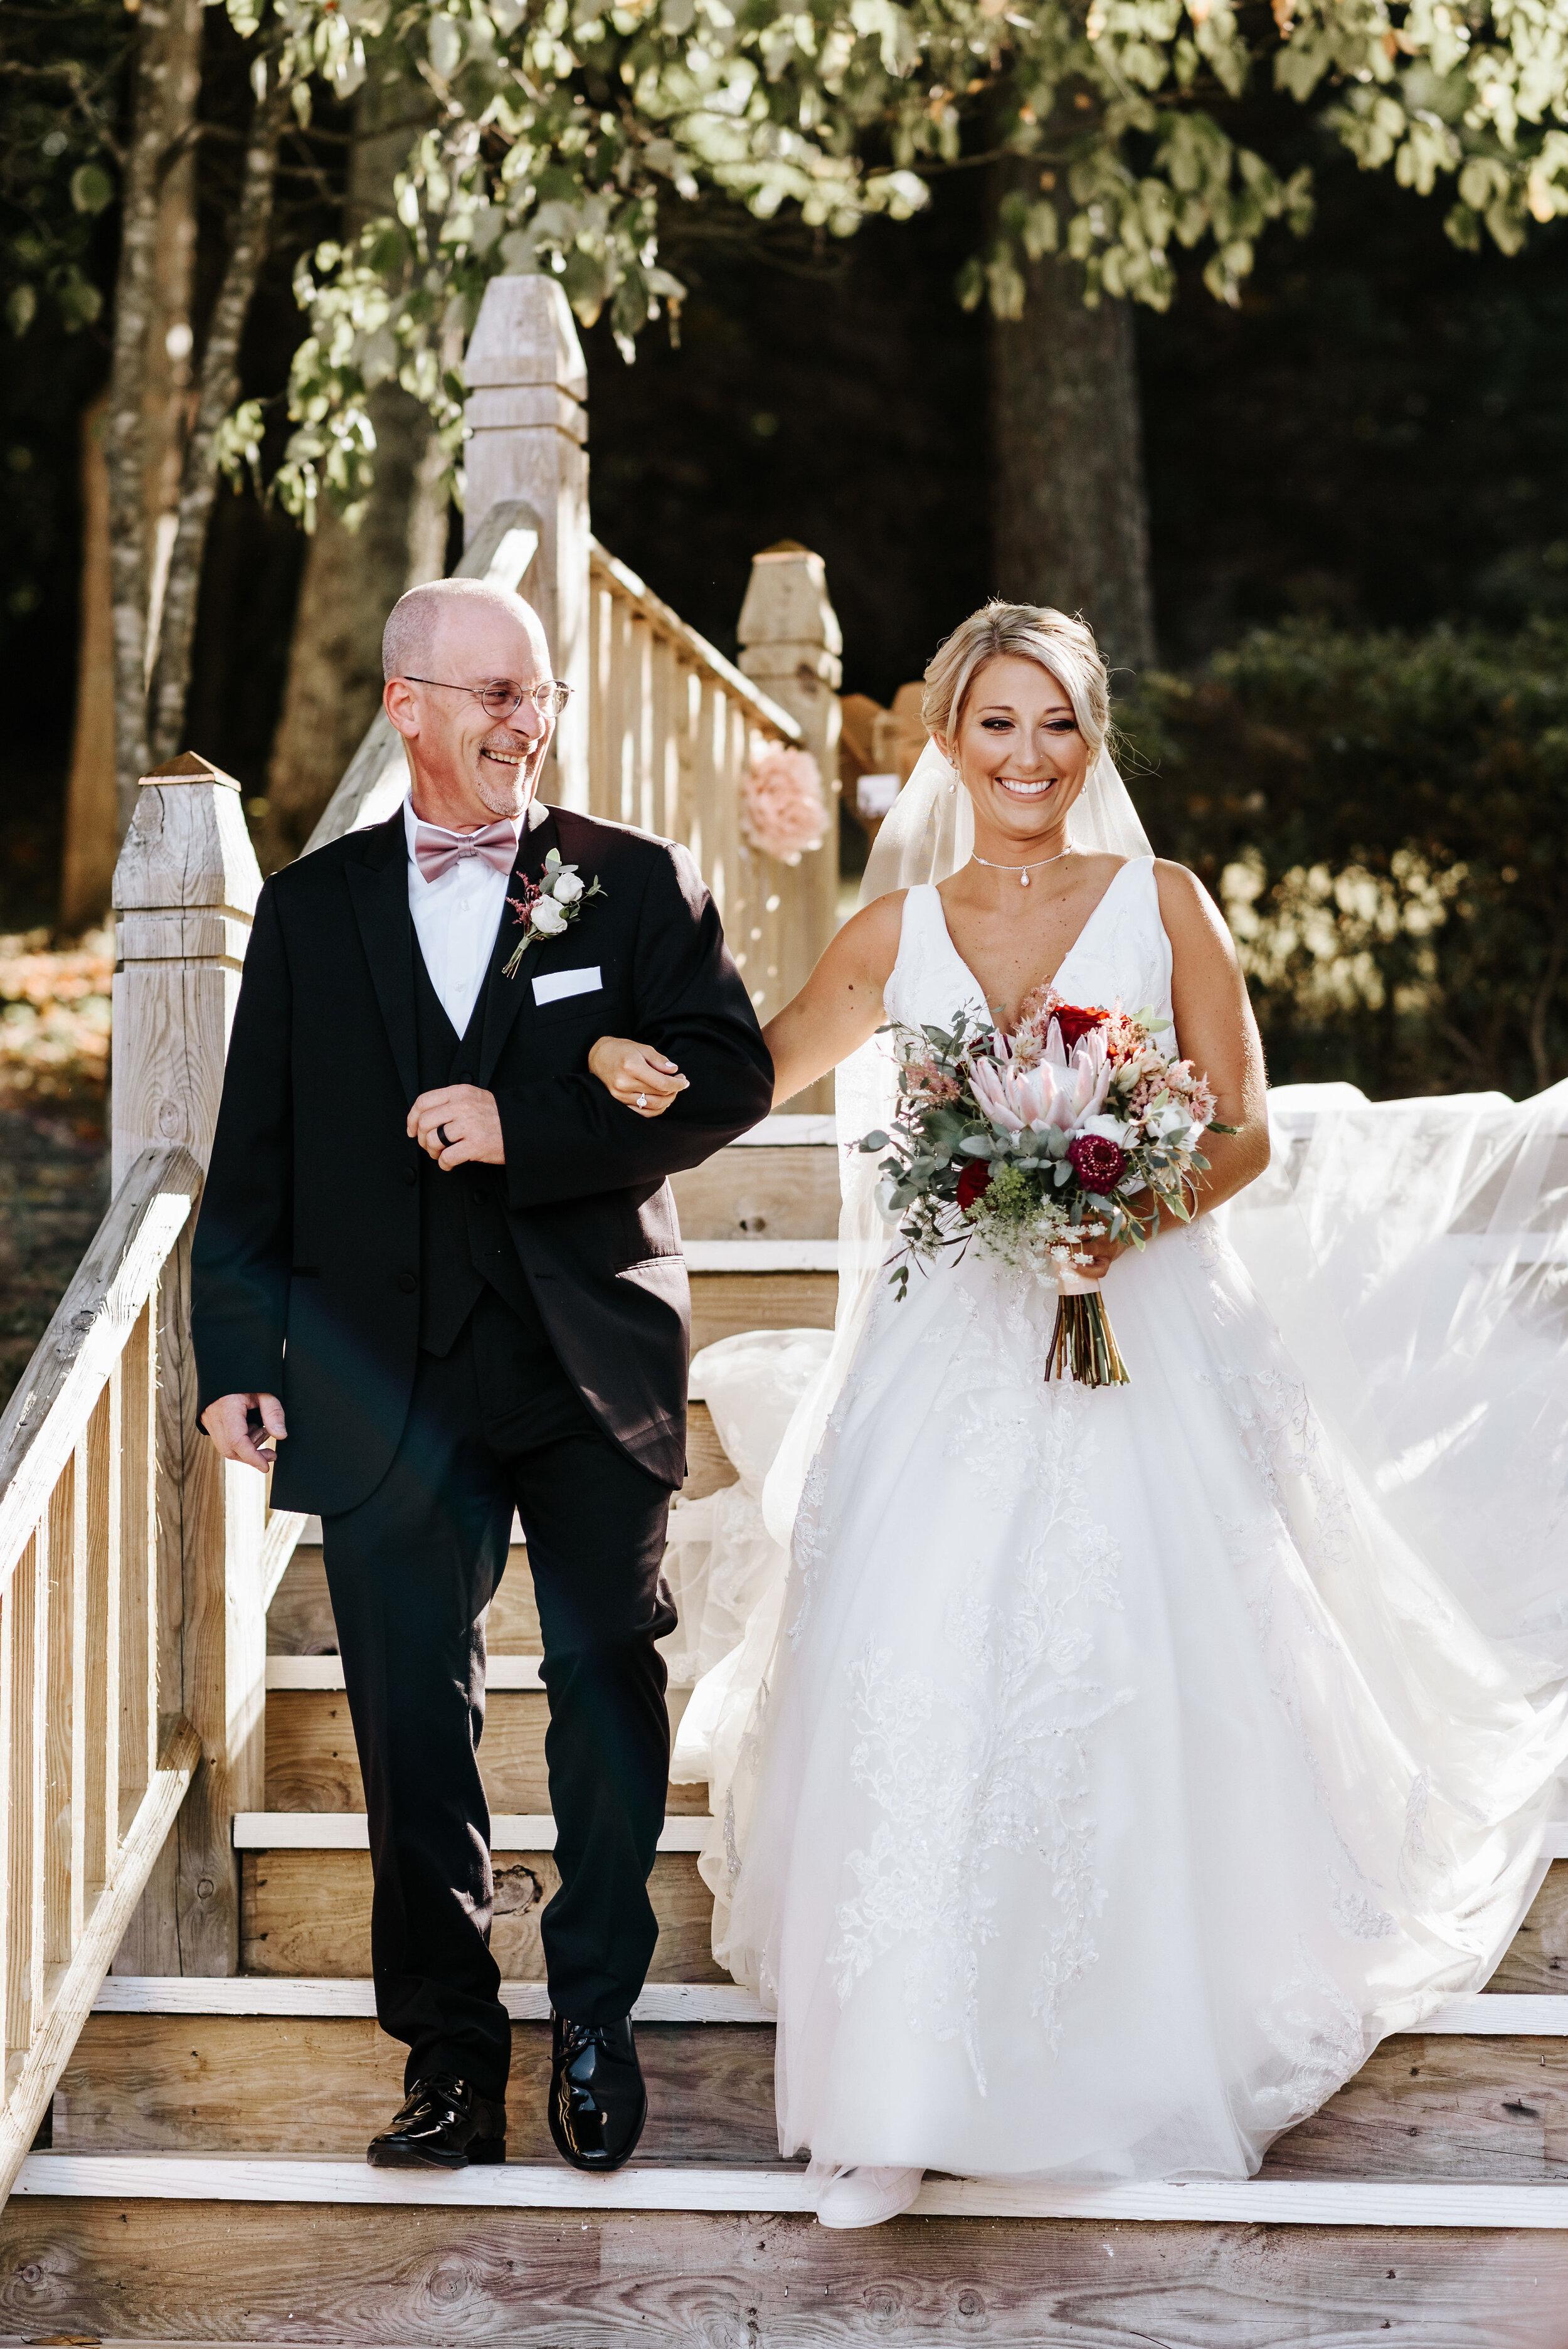 Emily_Mike_Wedding_Celebrations_at_the_Reservoir_Pool_Pavilion_Richmond_Virginia_Wedding_Photographer_Photography_by_V_43.jpg